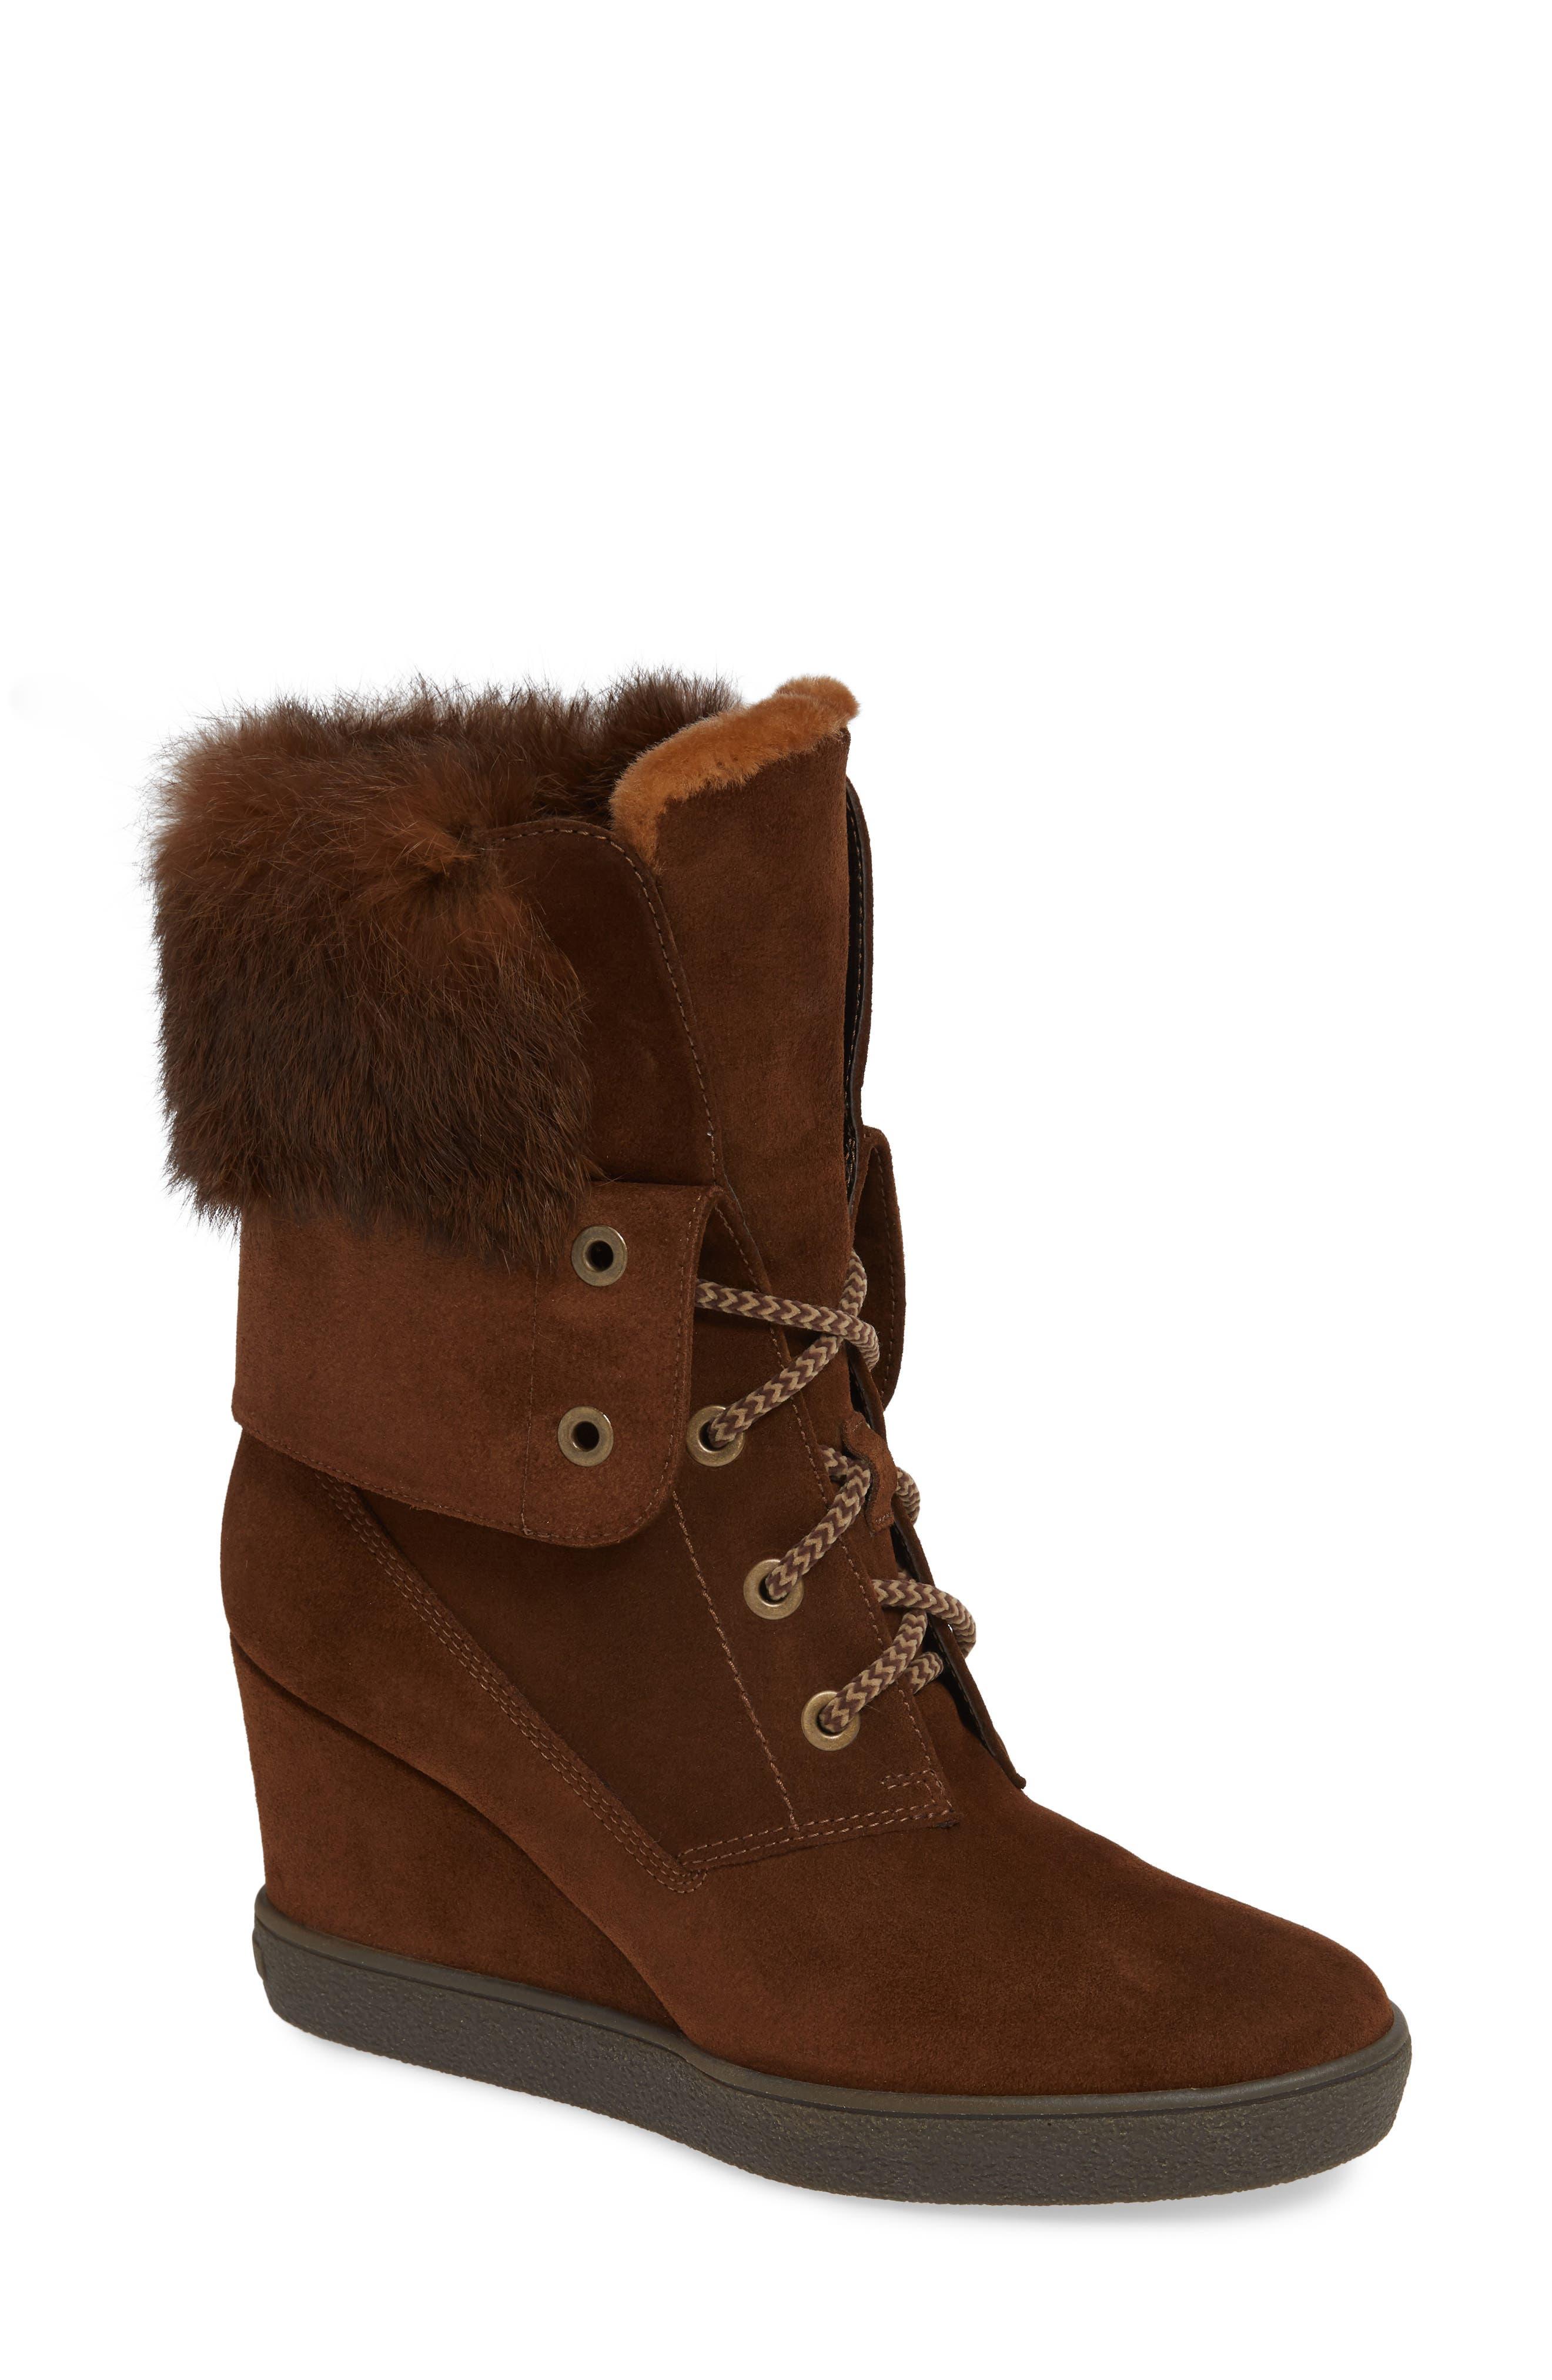 Aquatalia Cordelia Water Resistant Genuine Rabbit Fur Boot, Brown